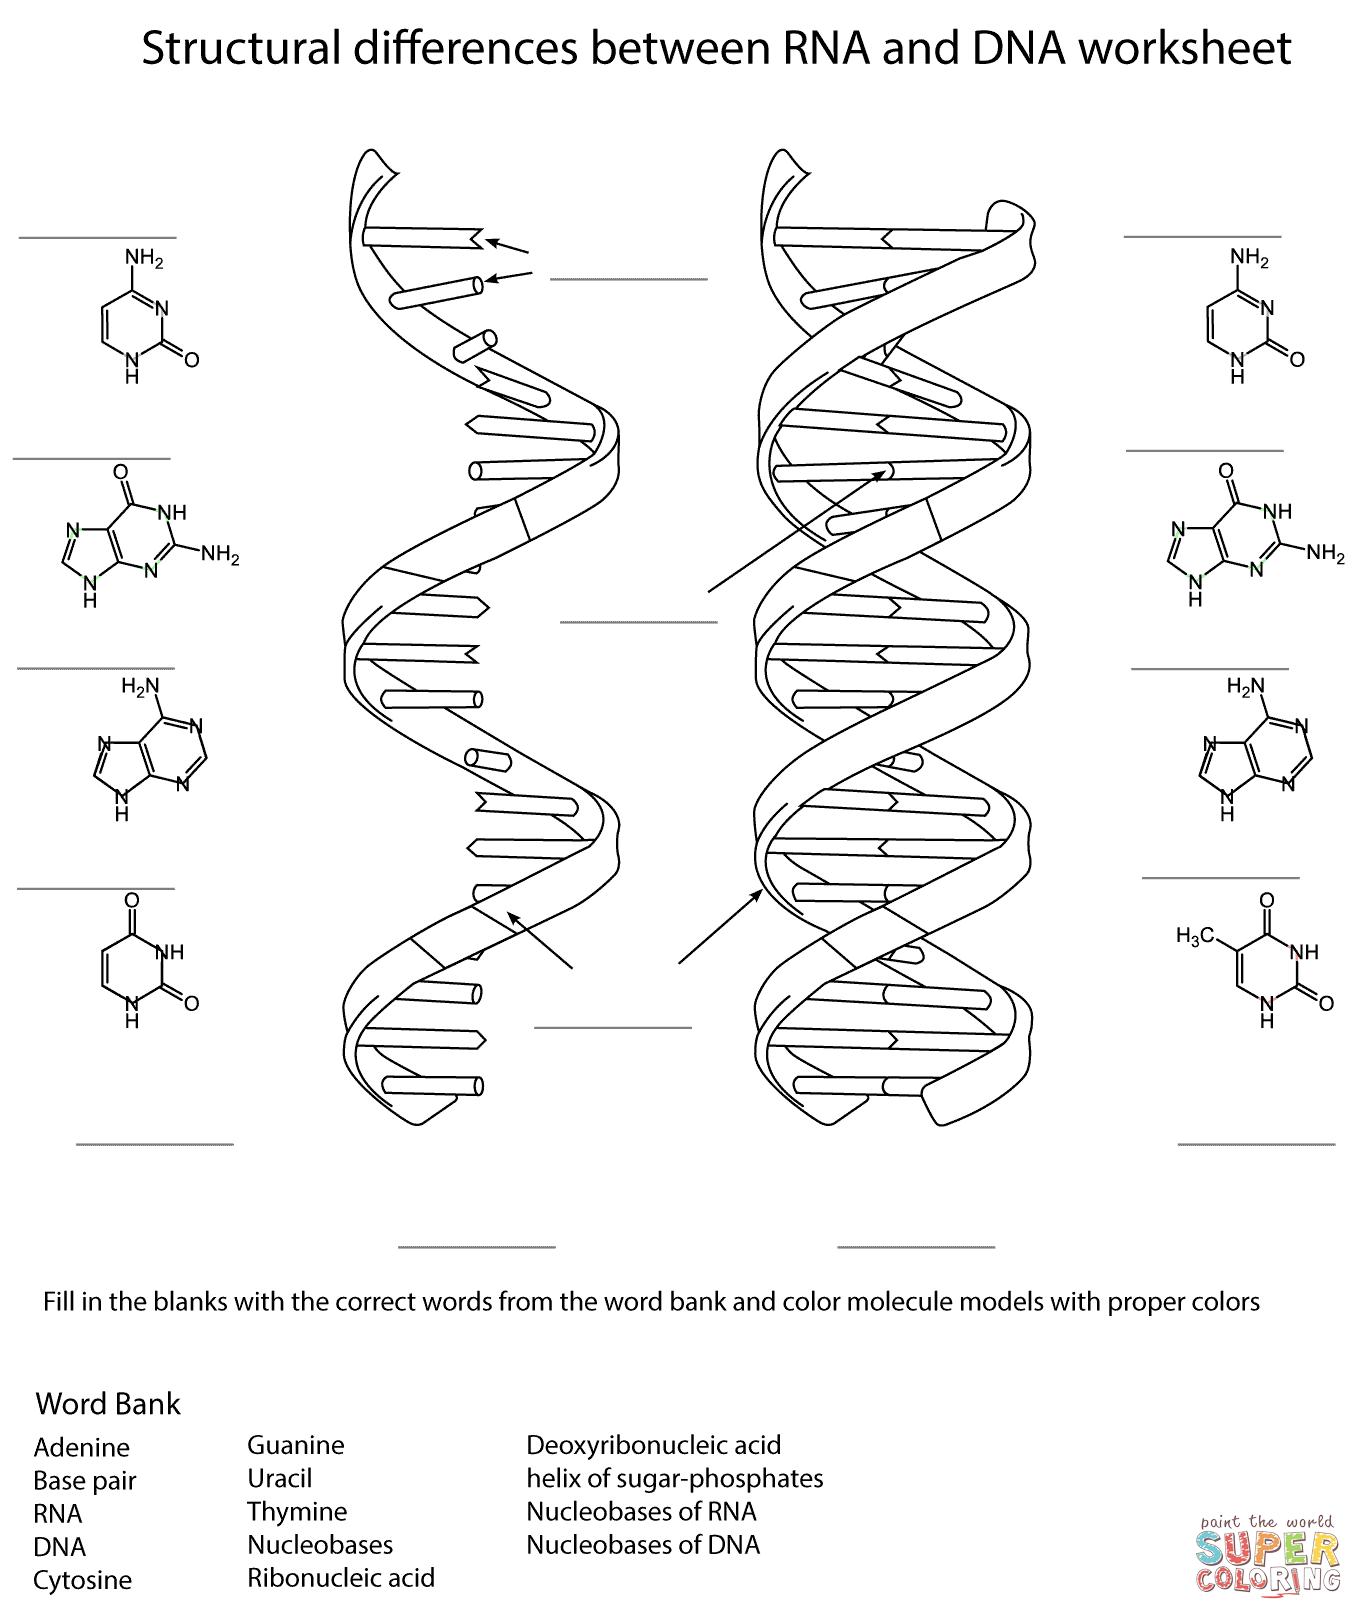 dna replication diagram worksheet human hand bones rna and coloring page free printable